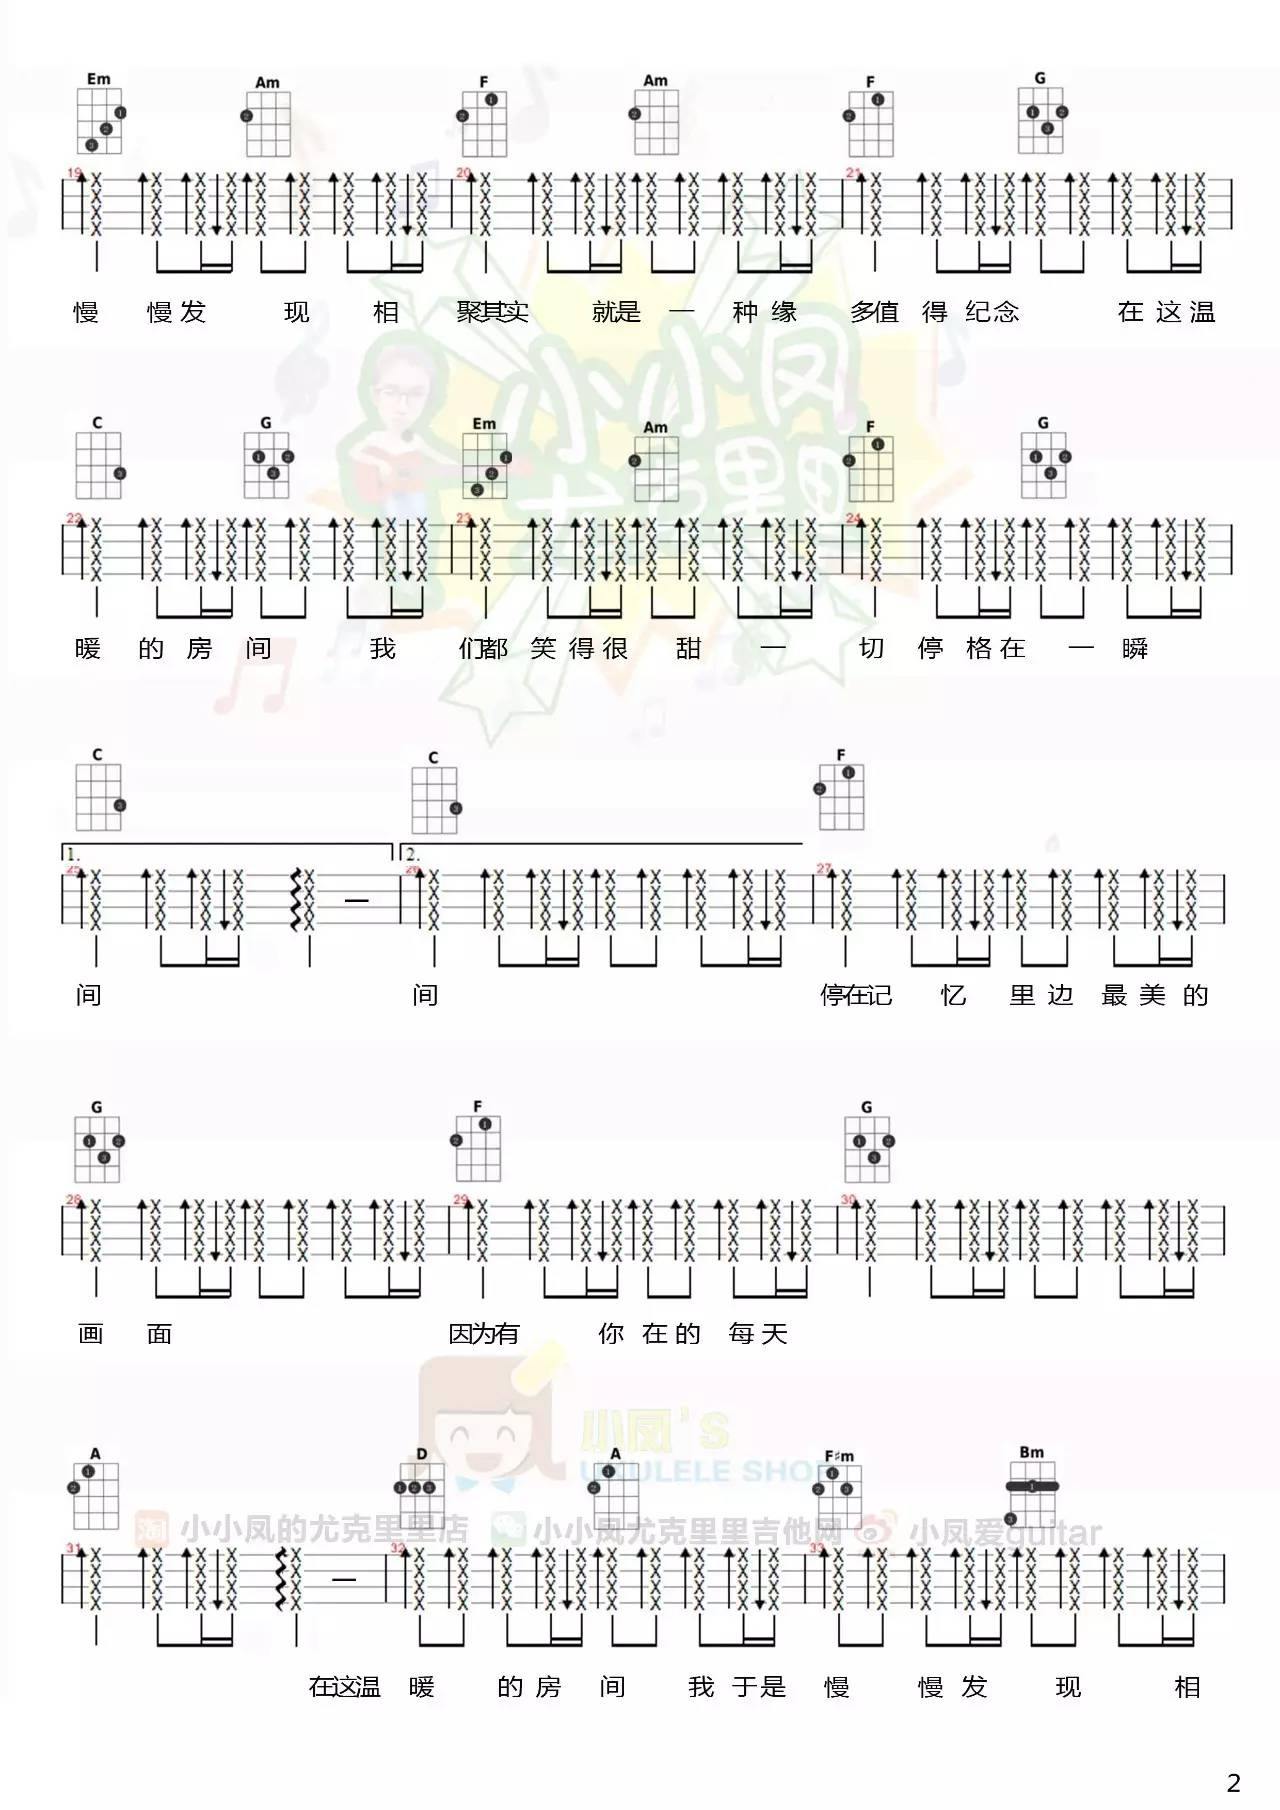 《房间》ukulele弹唱伴奏谱